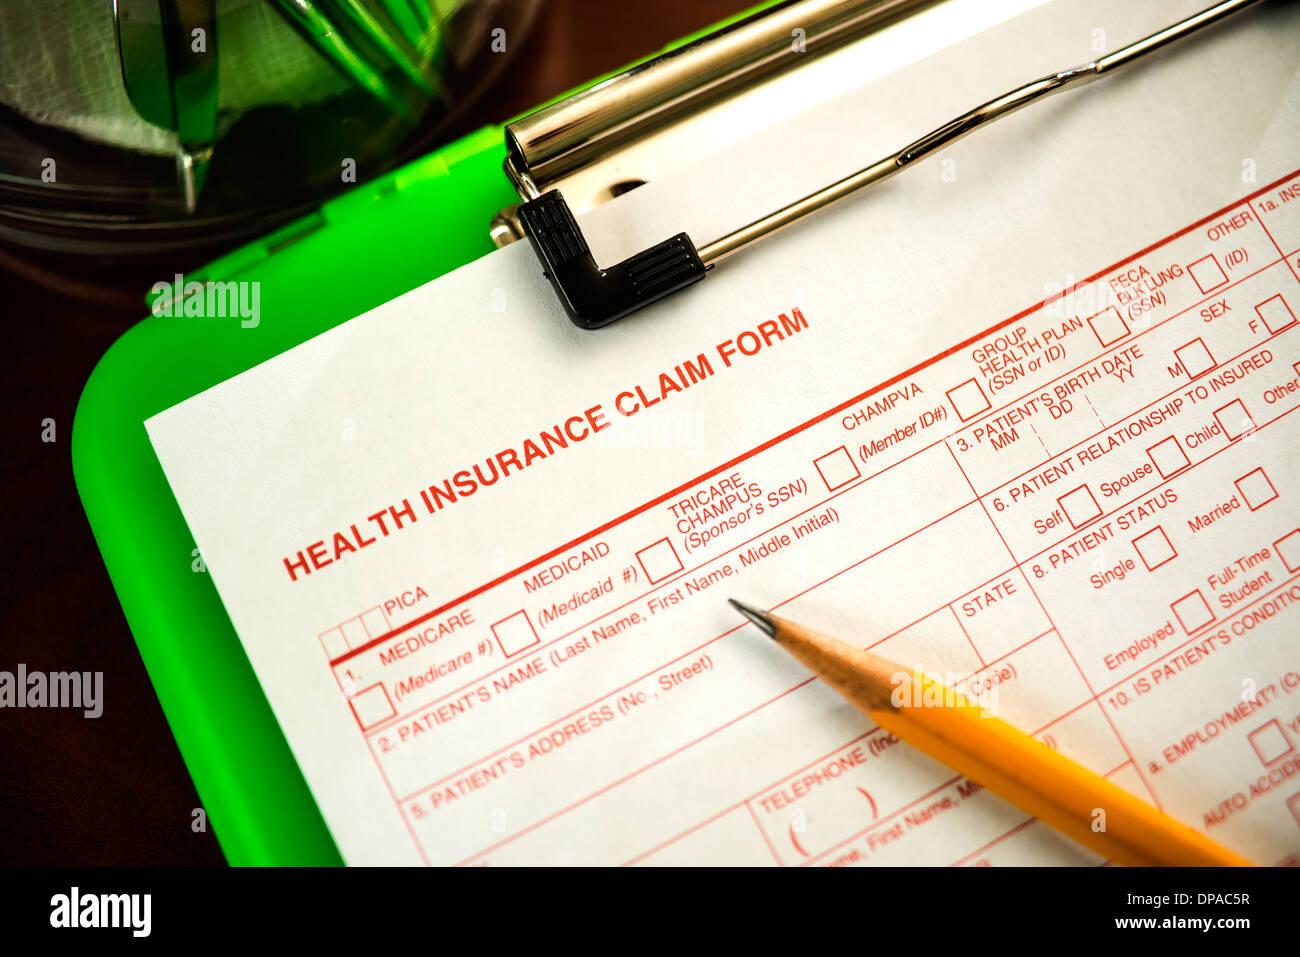 Health Insurance Claim Form Shallow Dof Stock Photo 65382627 Alamy